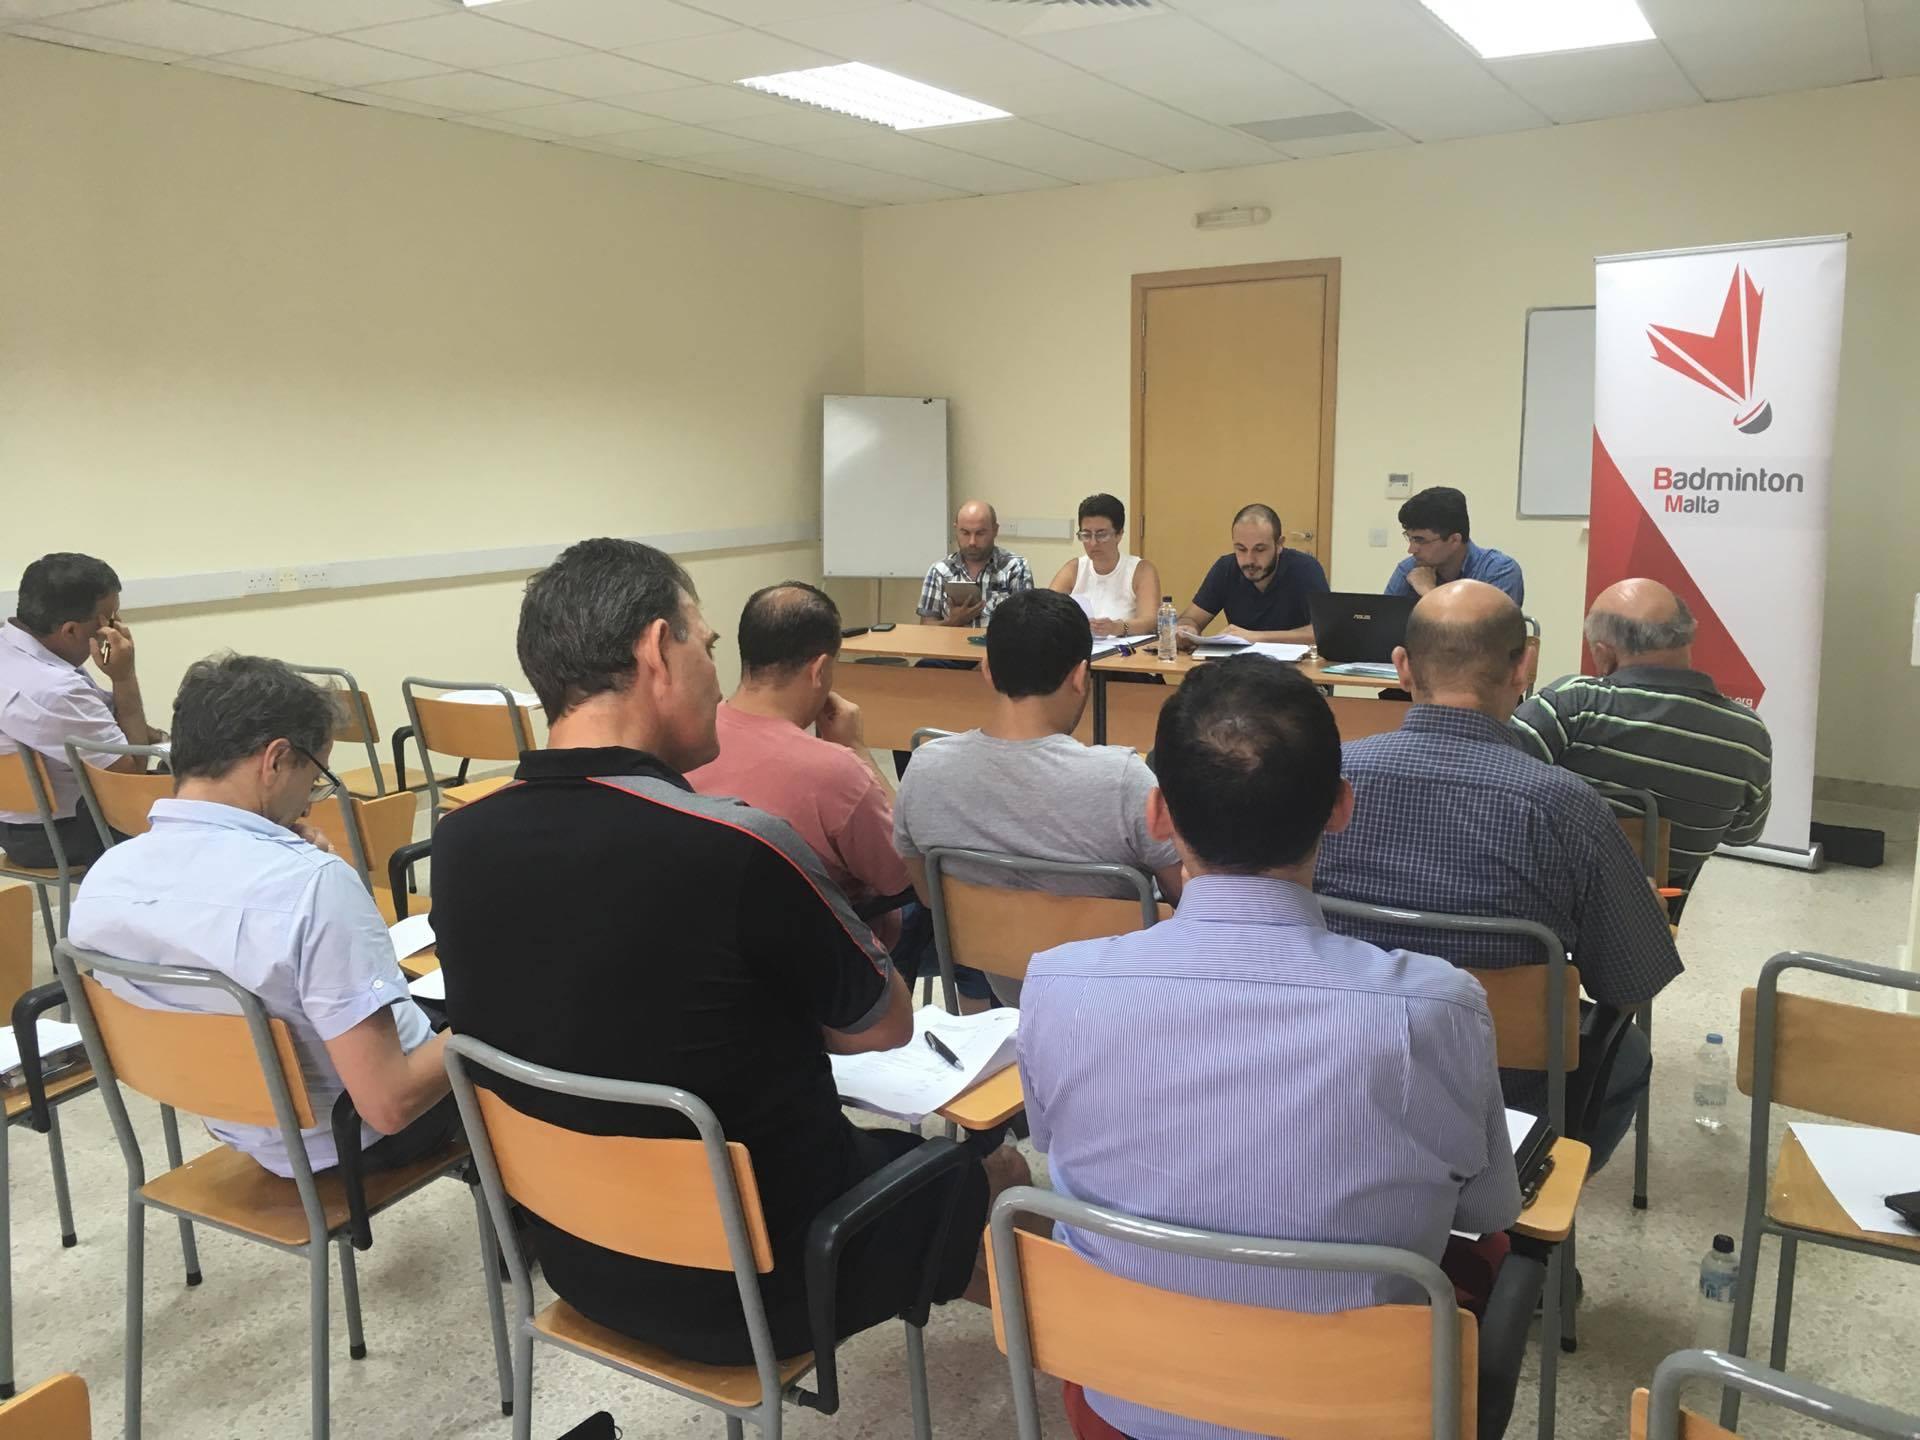 Badminton Malta Executive Committee Confirmed